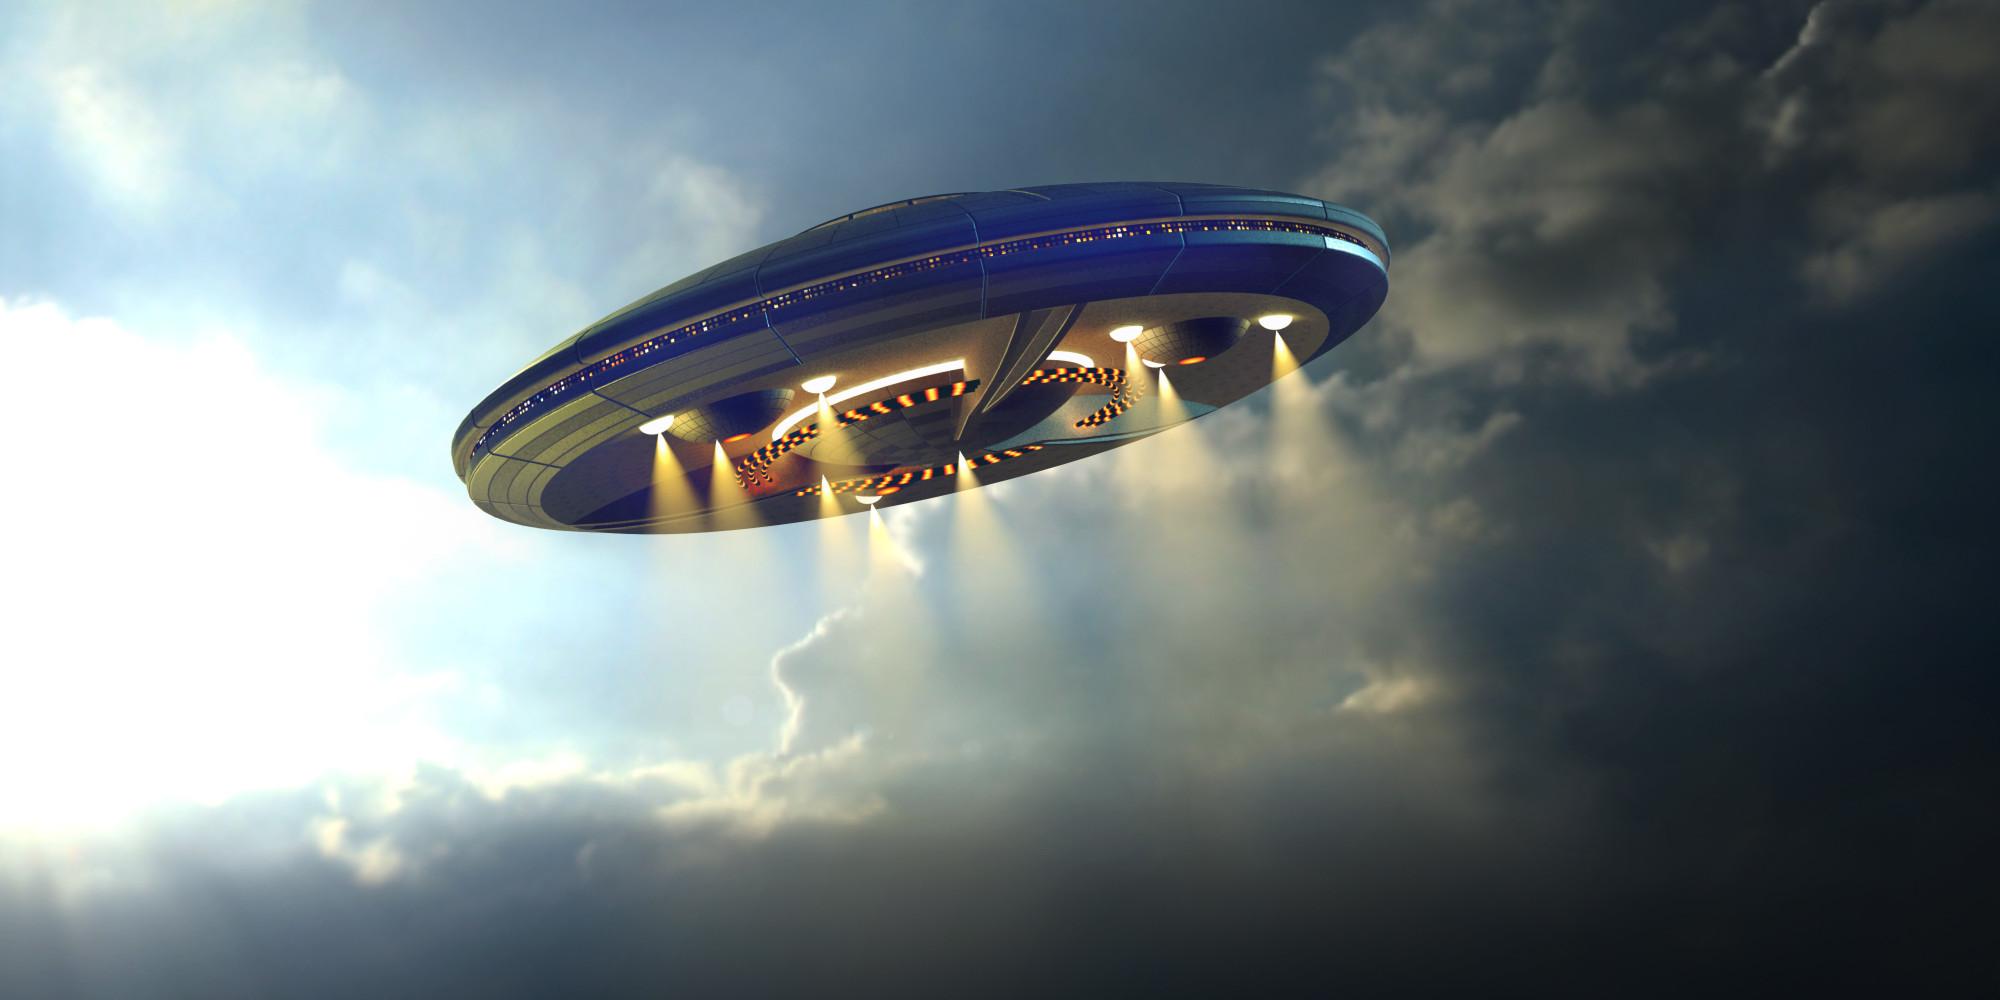 alien sightings - photo #19